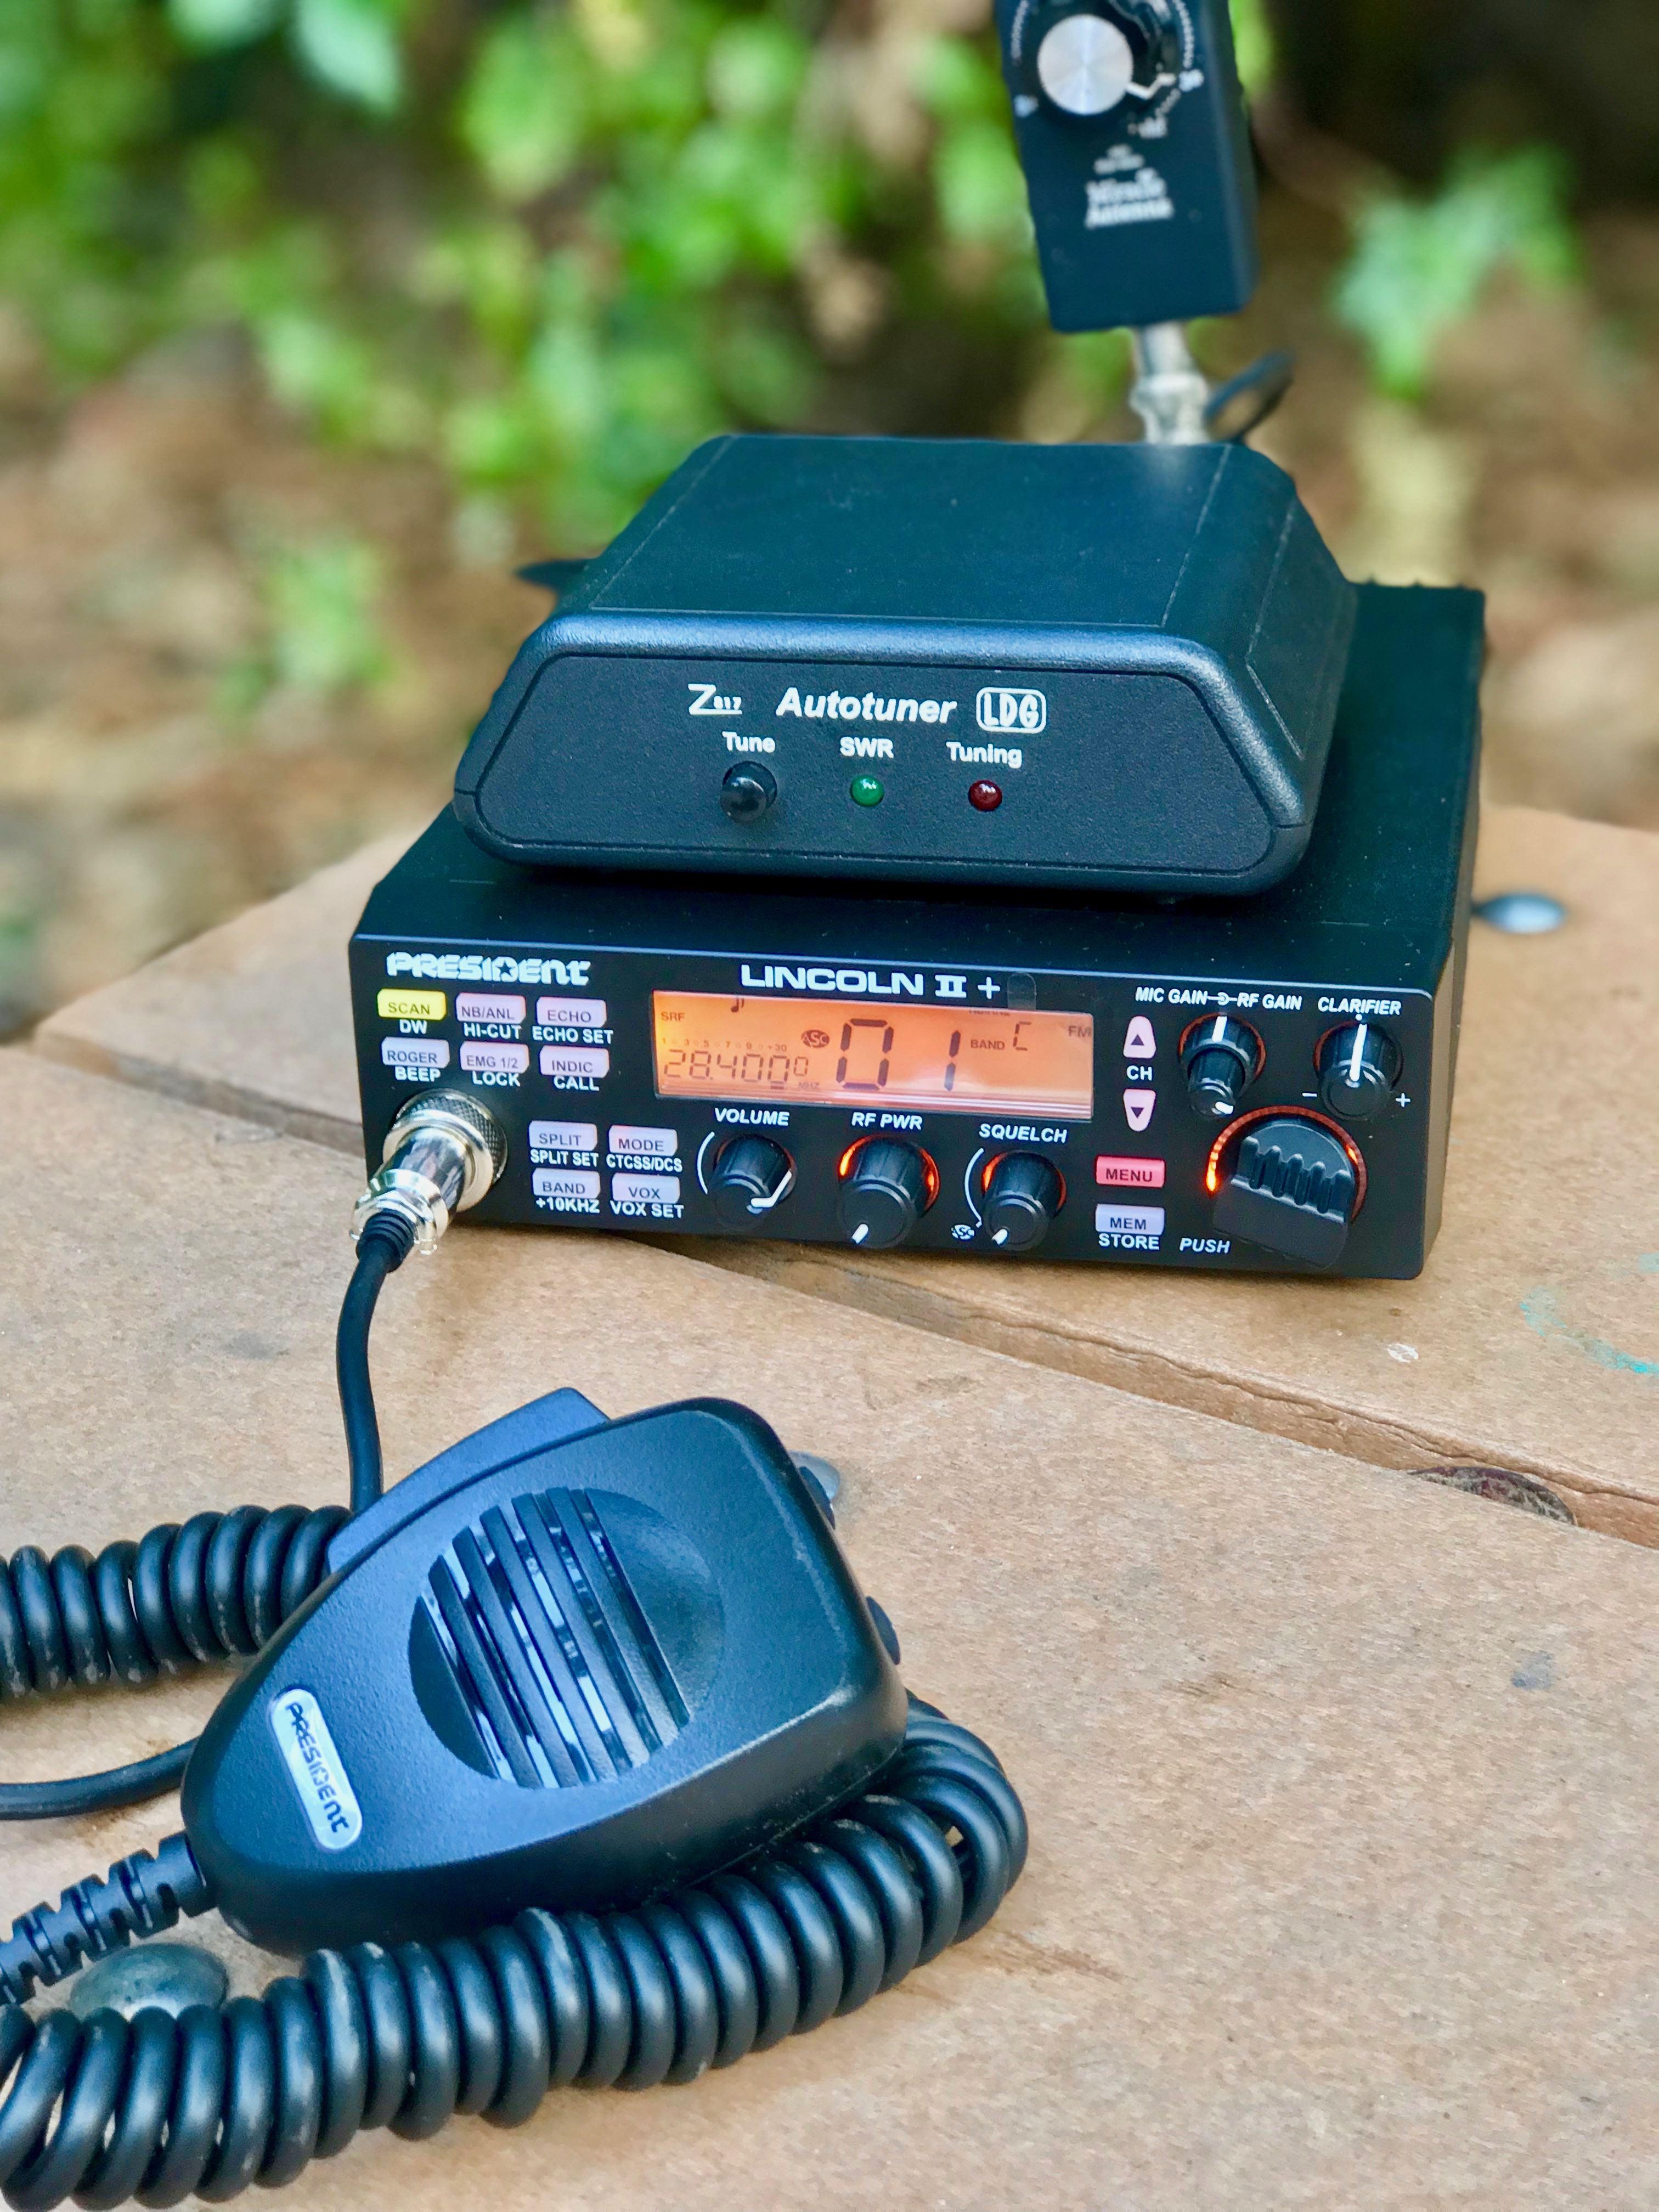 President Lincoln II 10 Meter Amateur Radio Shortwave Radios ...